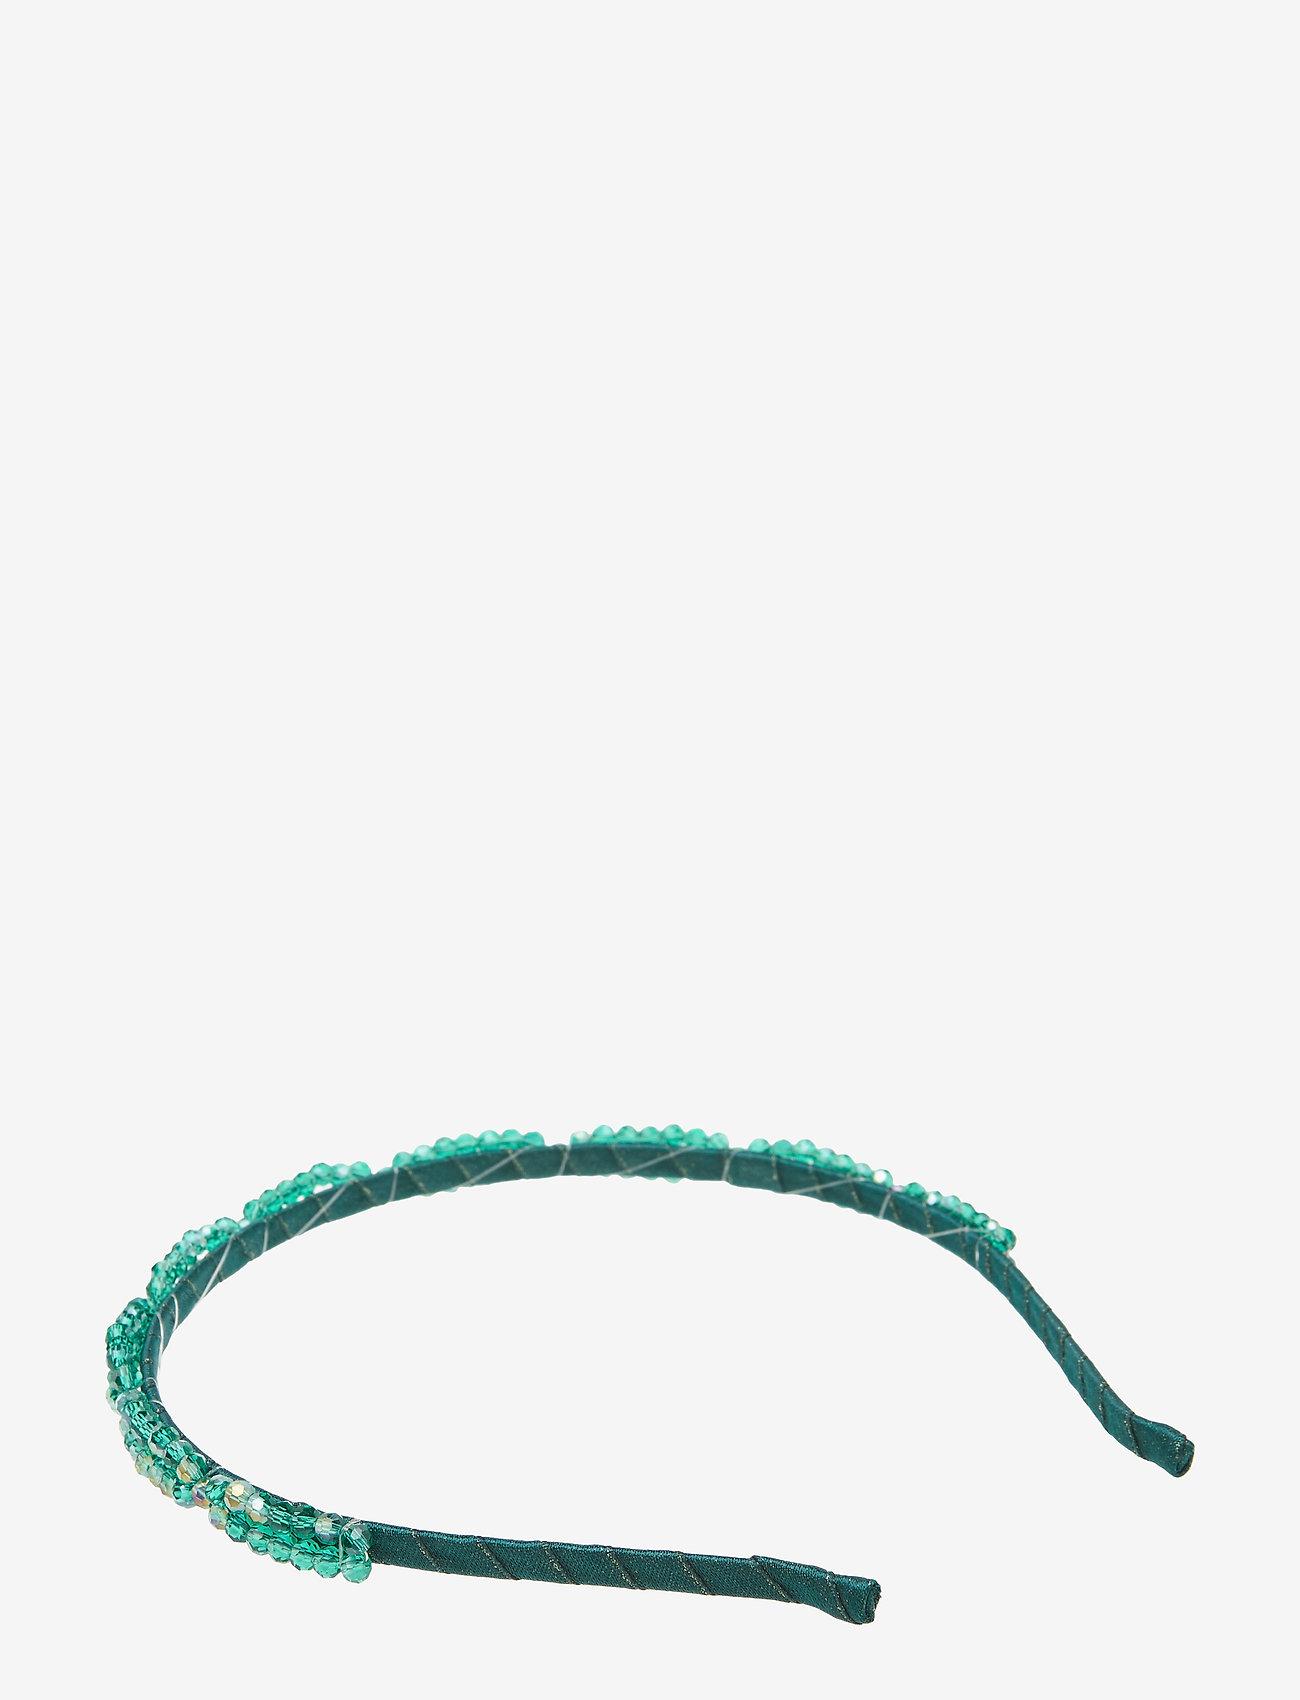 PIPOL'S BAZAAR - Trissa Embroidered PIPOL Diadema Green - hair accessories - green